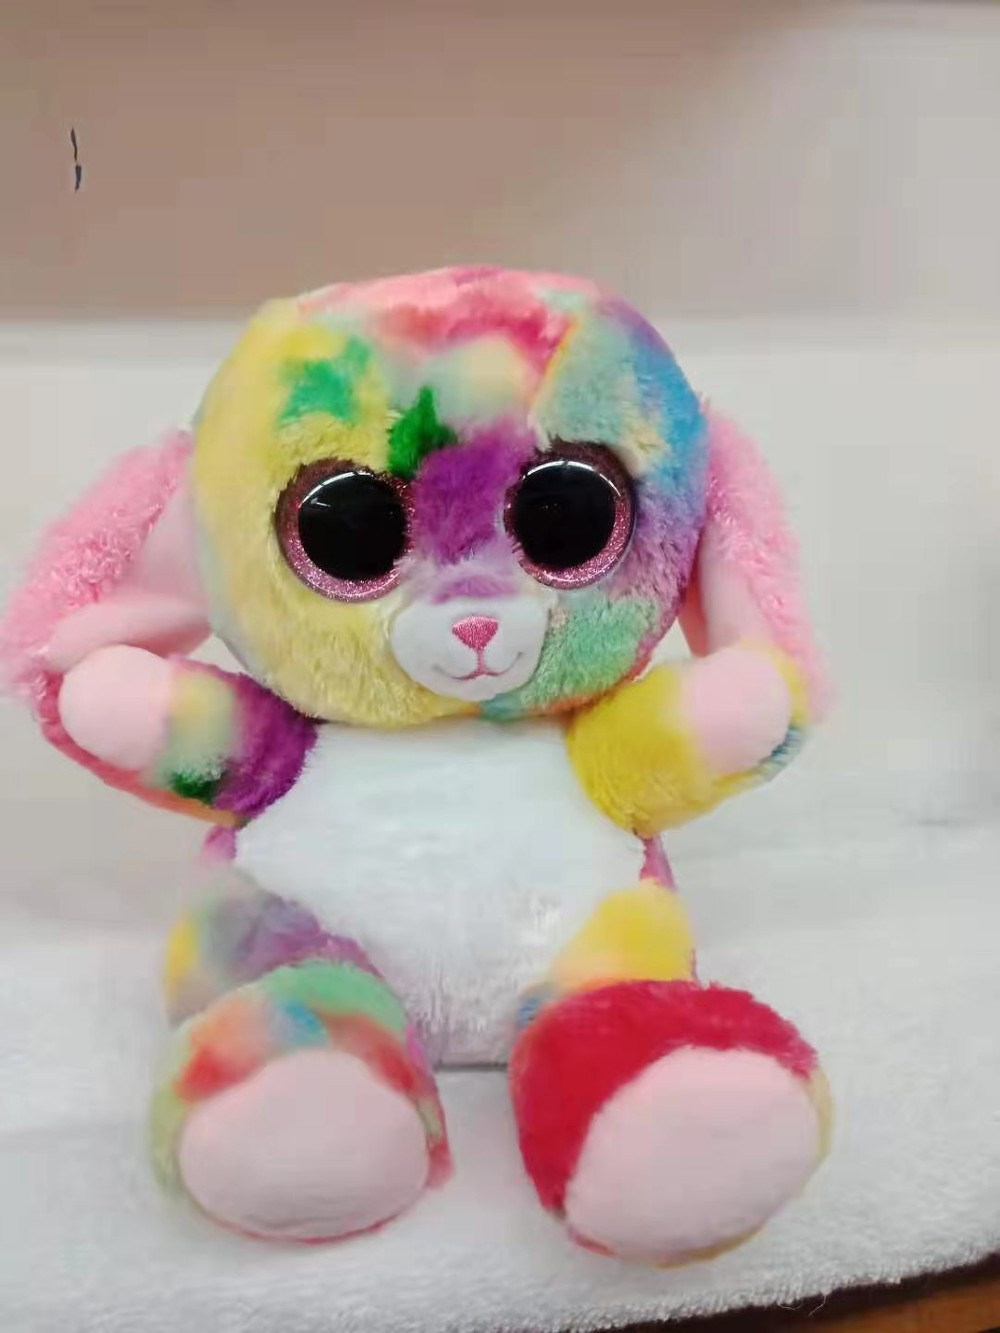 Soft Animal Plush Toys Big Eyes Plush Doll